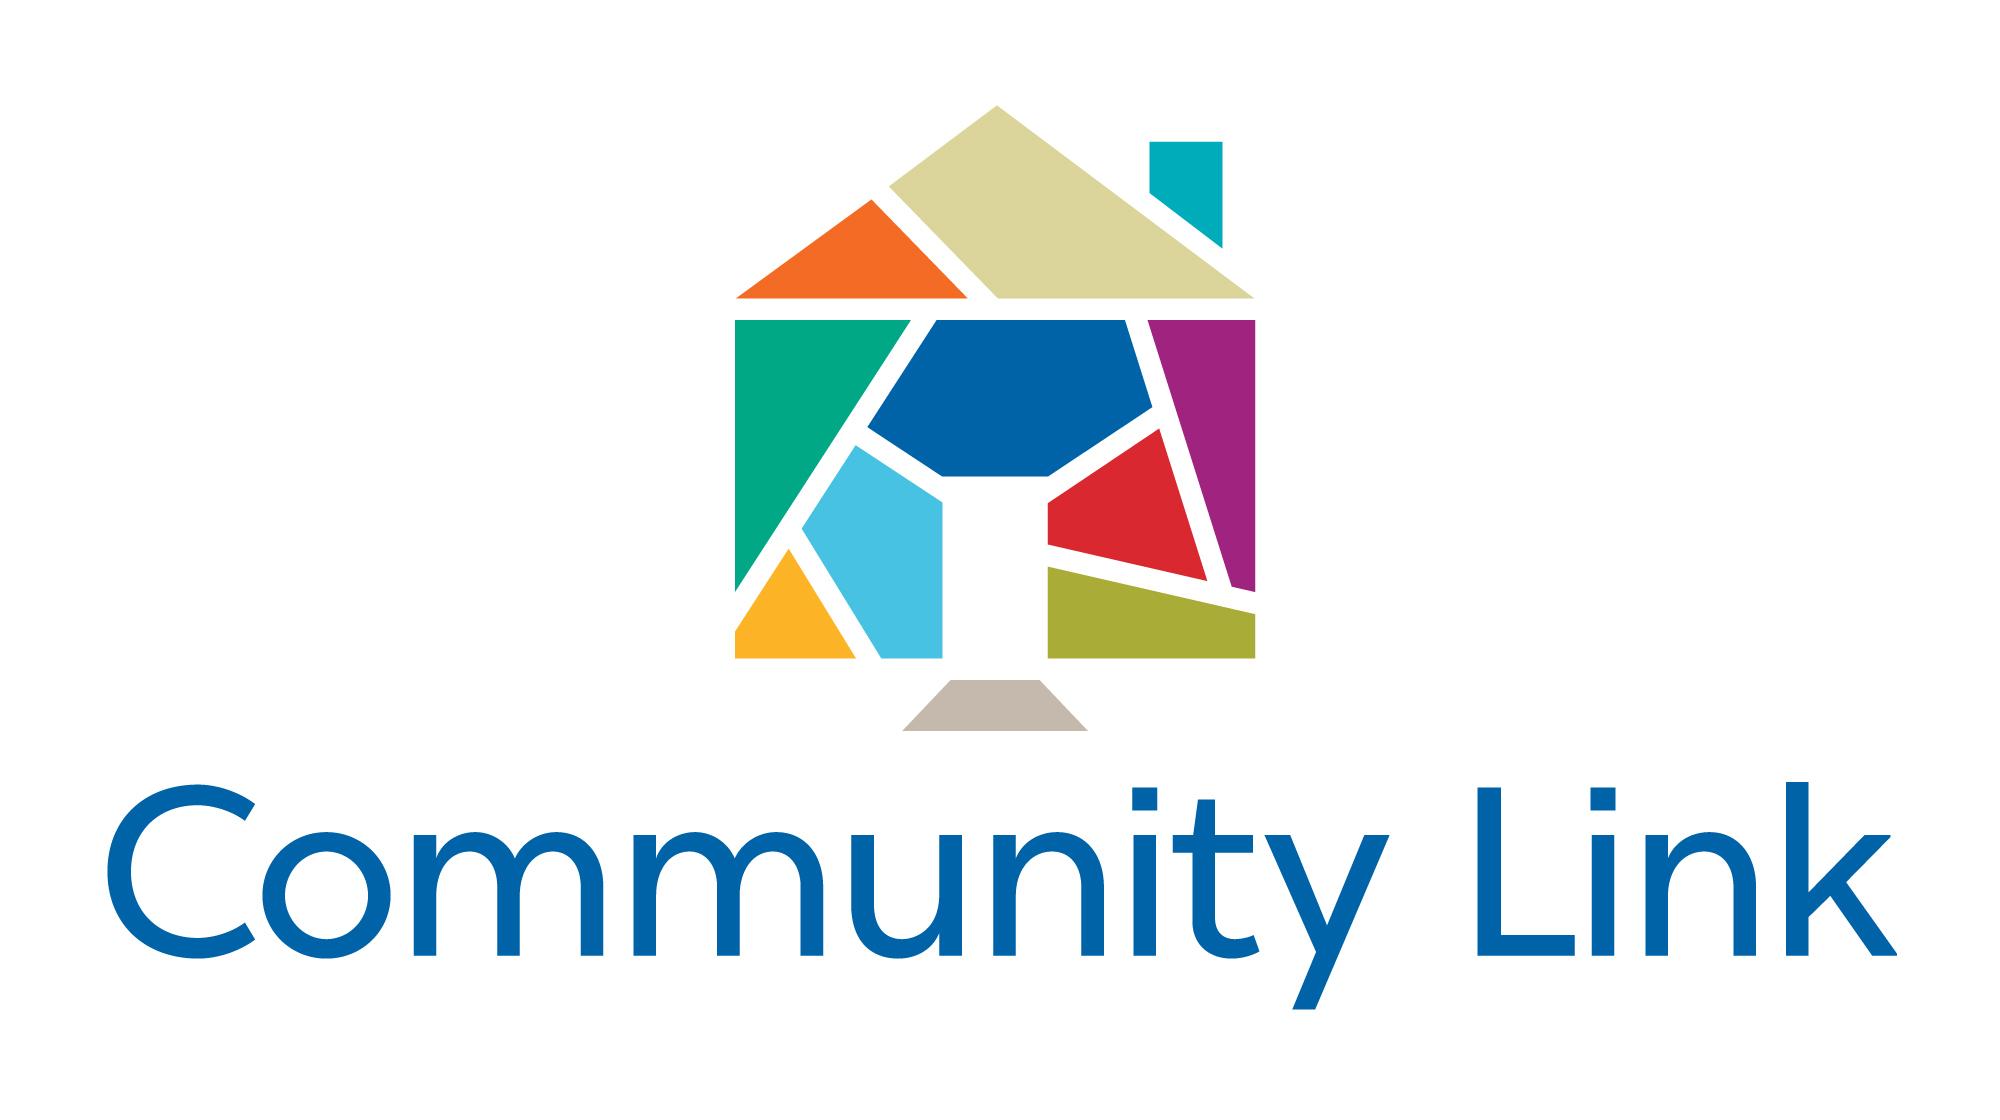 Community link logo 2019